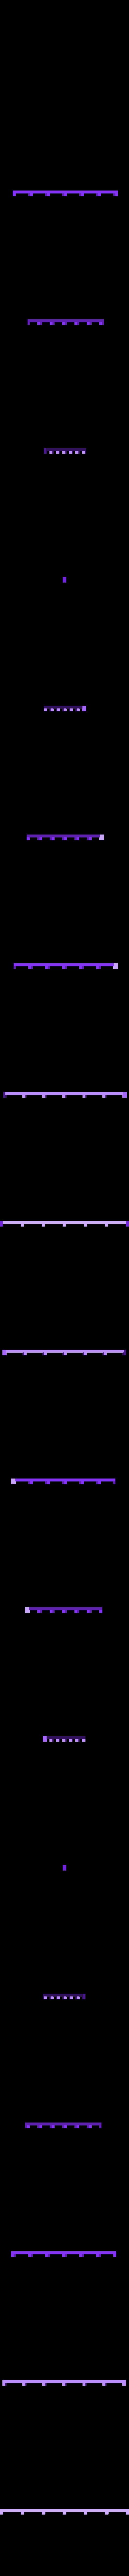 G traverse2 sous ridelle.STL Download STL file Draisine Matisa for LGB • 3D printable object, biddle